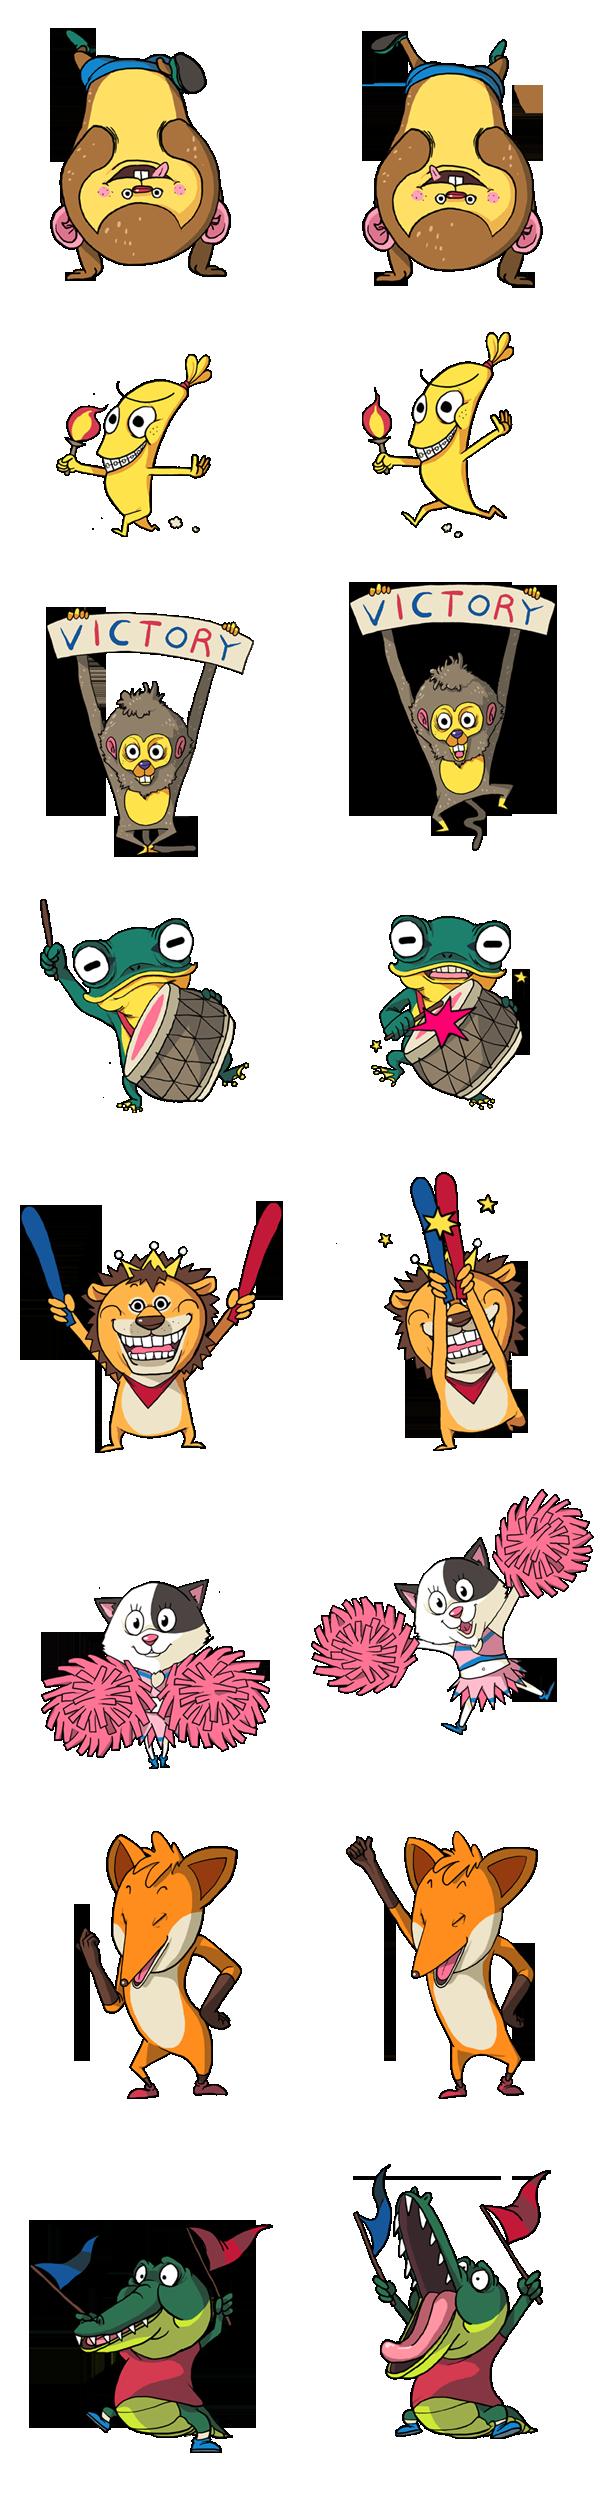 Special-Animal-Olympic-Sakiroo-Choi  (3)